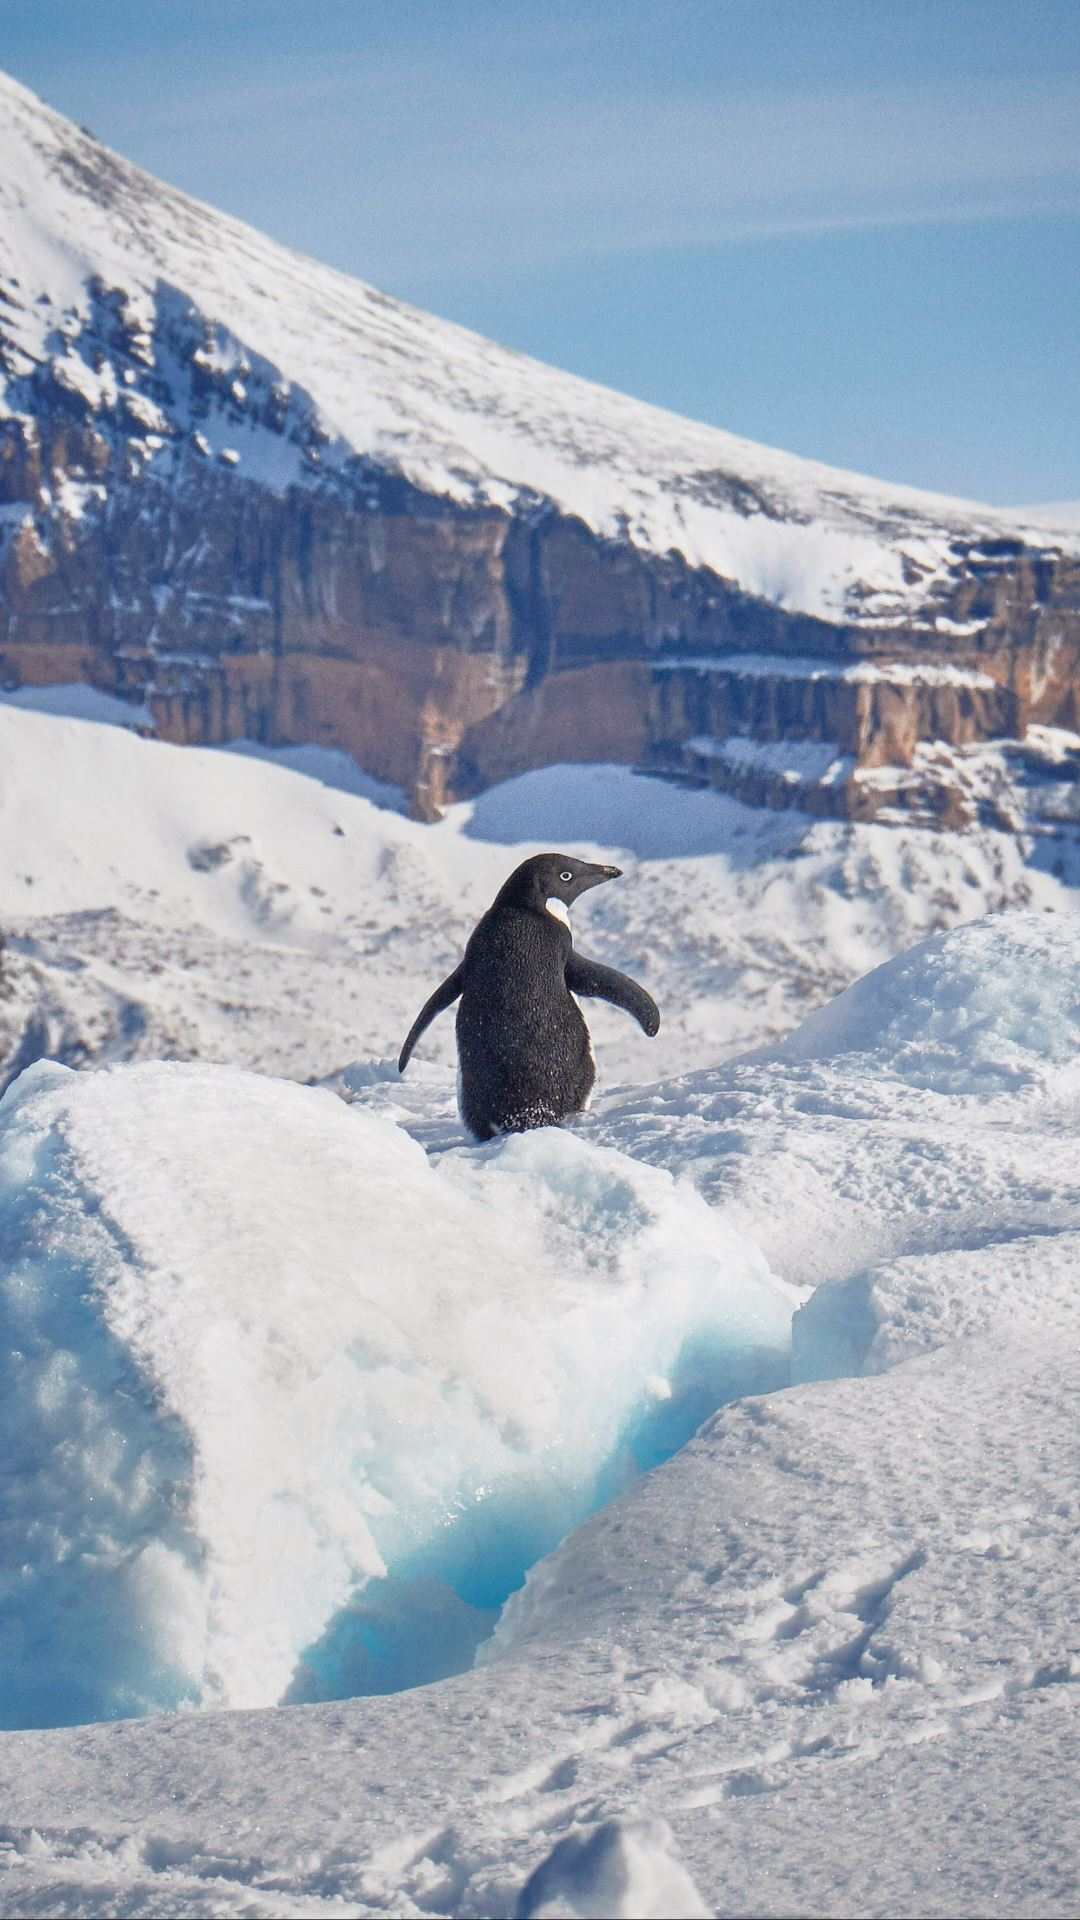 Wallpaper iPhone travel photography Antarctica penguin cute nature widlife iceberg